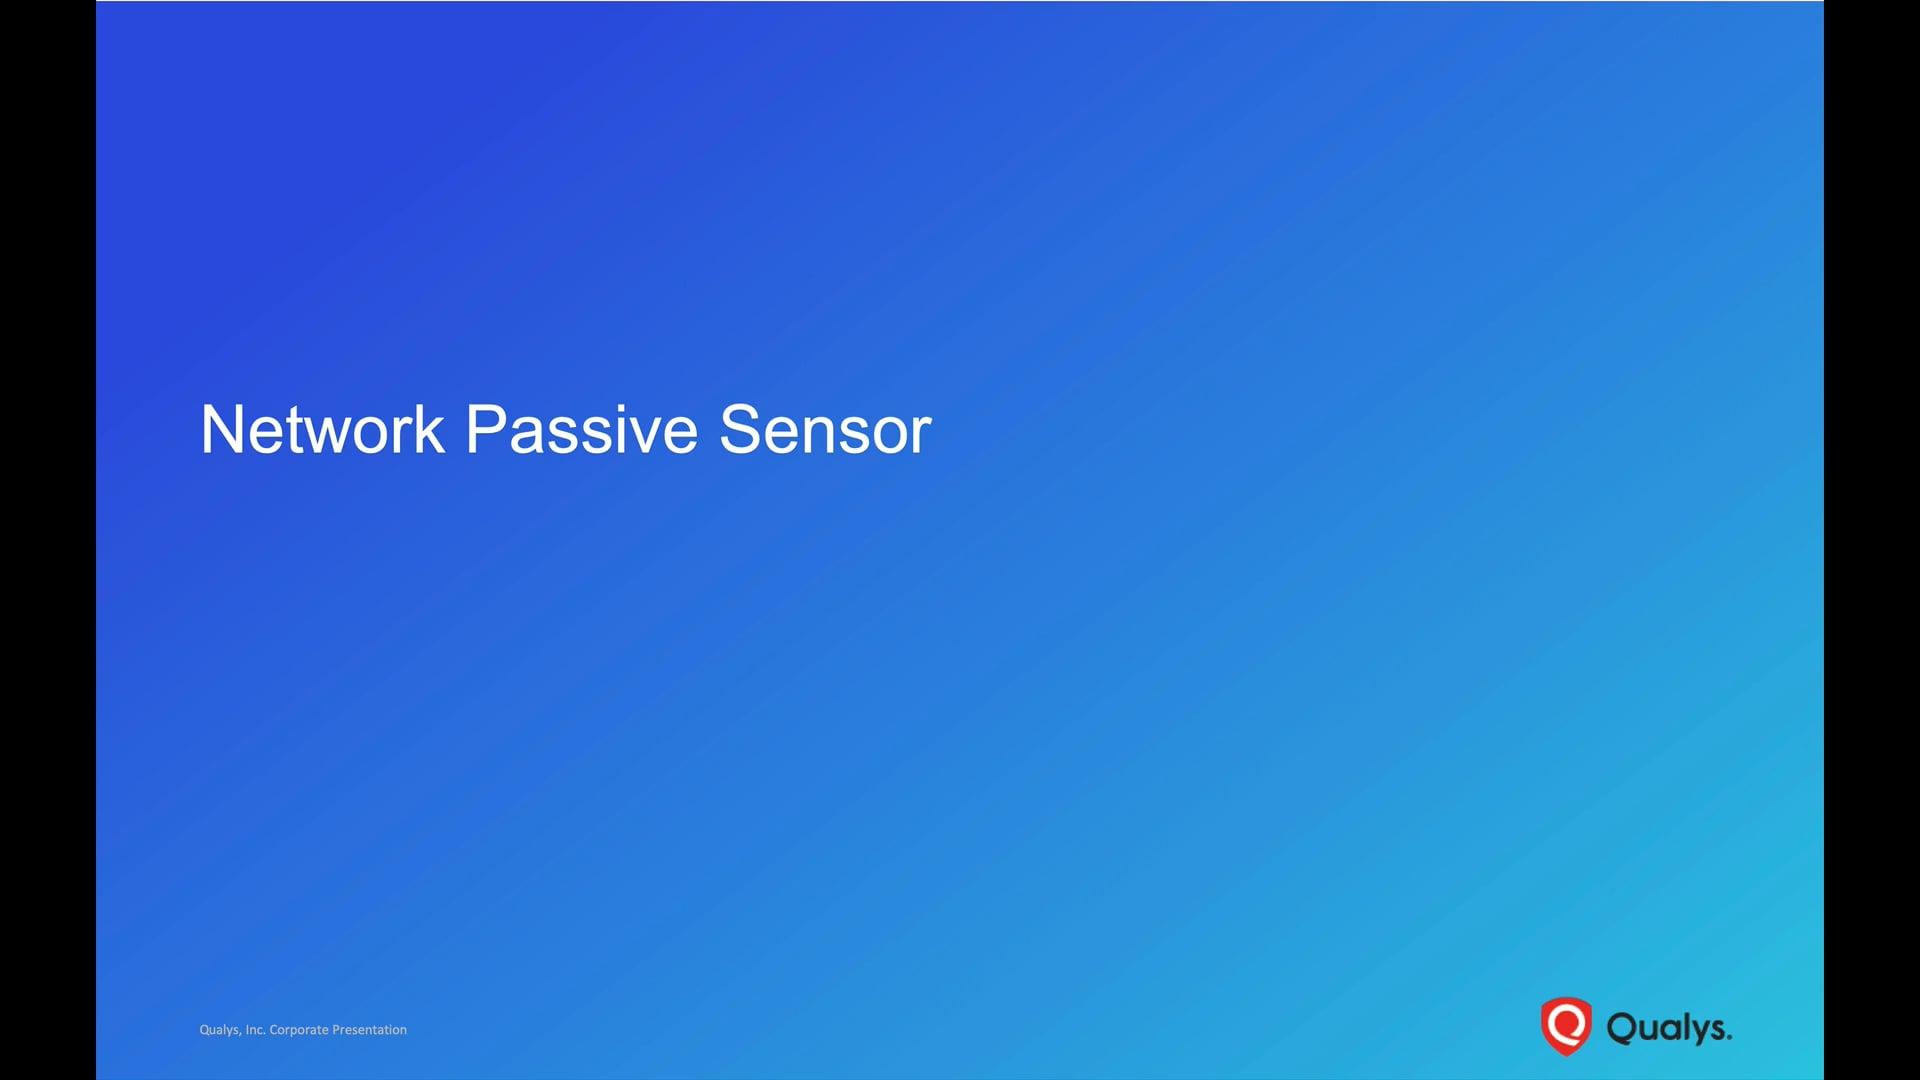 Network Passive Sensor Introduction